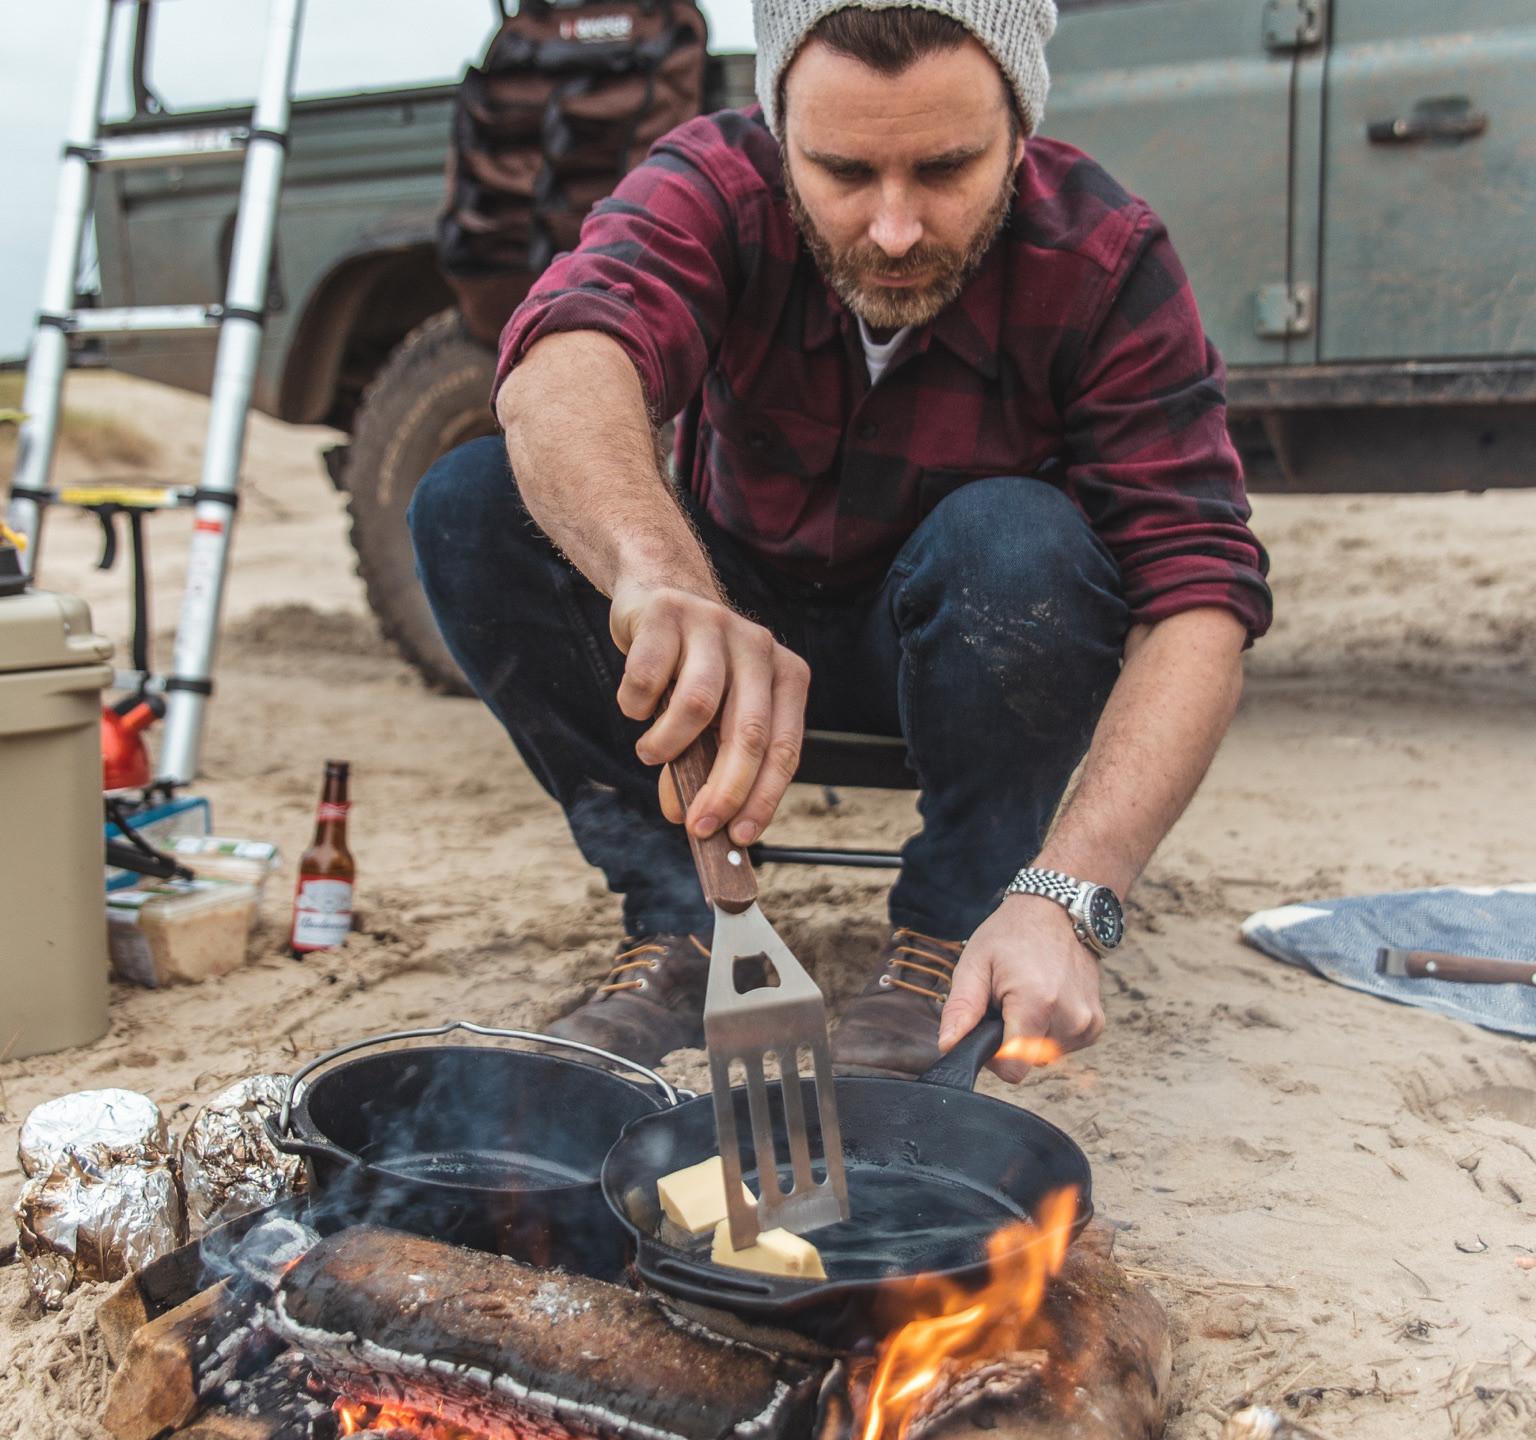 Ty Worthington Defender 130 Keswick Green camp cooking